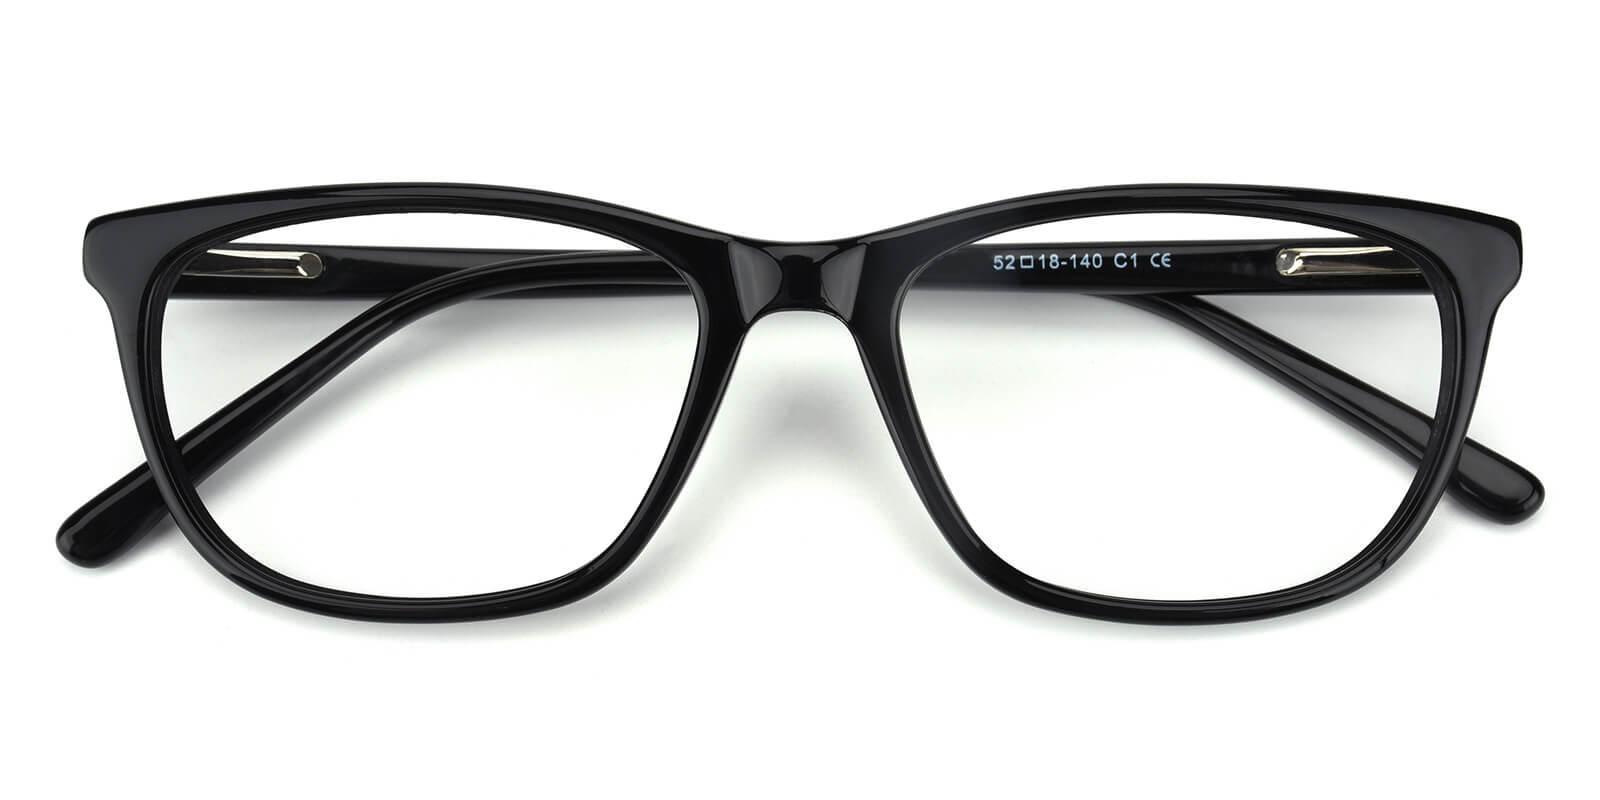 Emblem-Black-Square / Cat-Acetate-Eyeglasses-detail